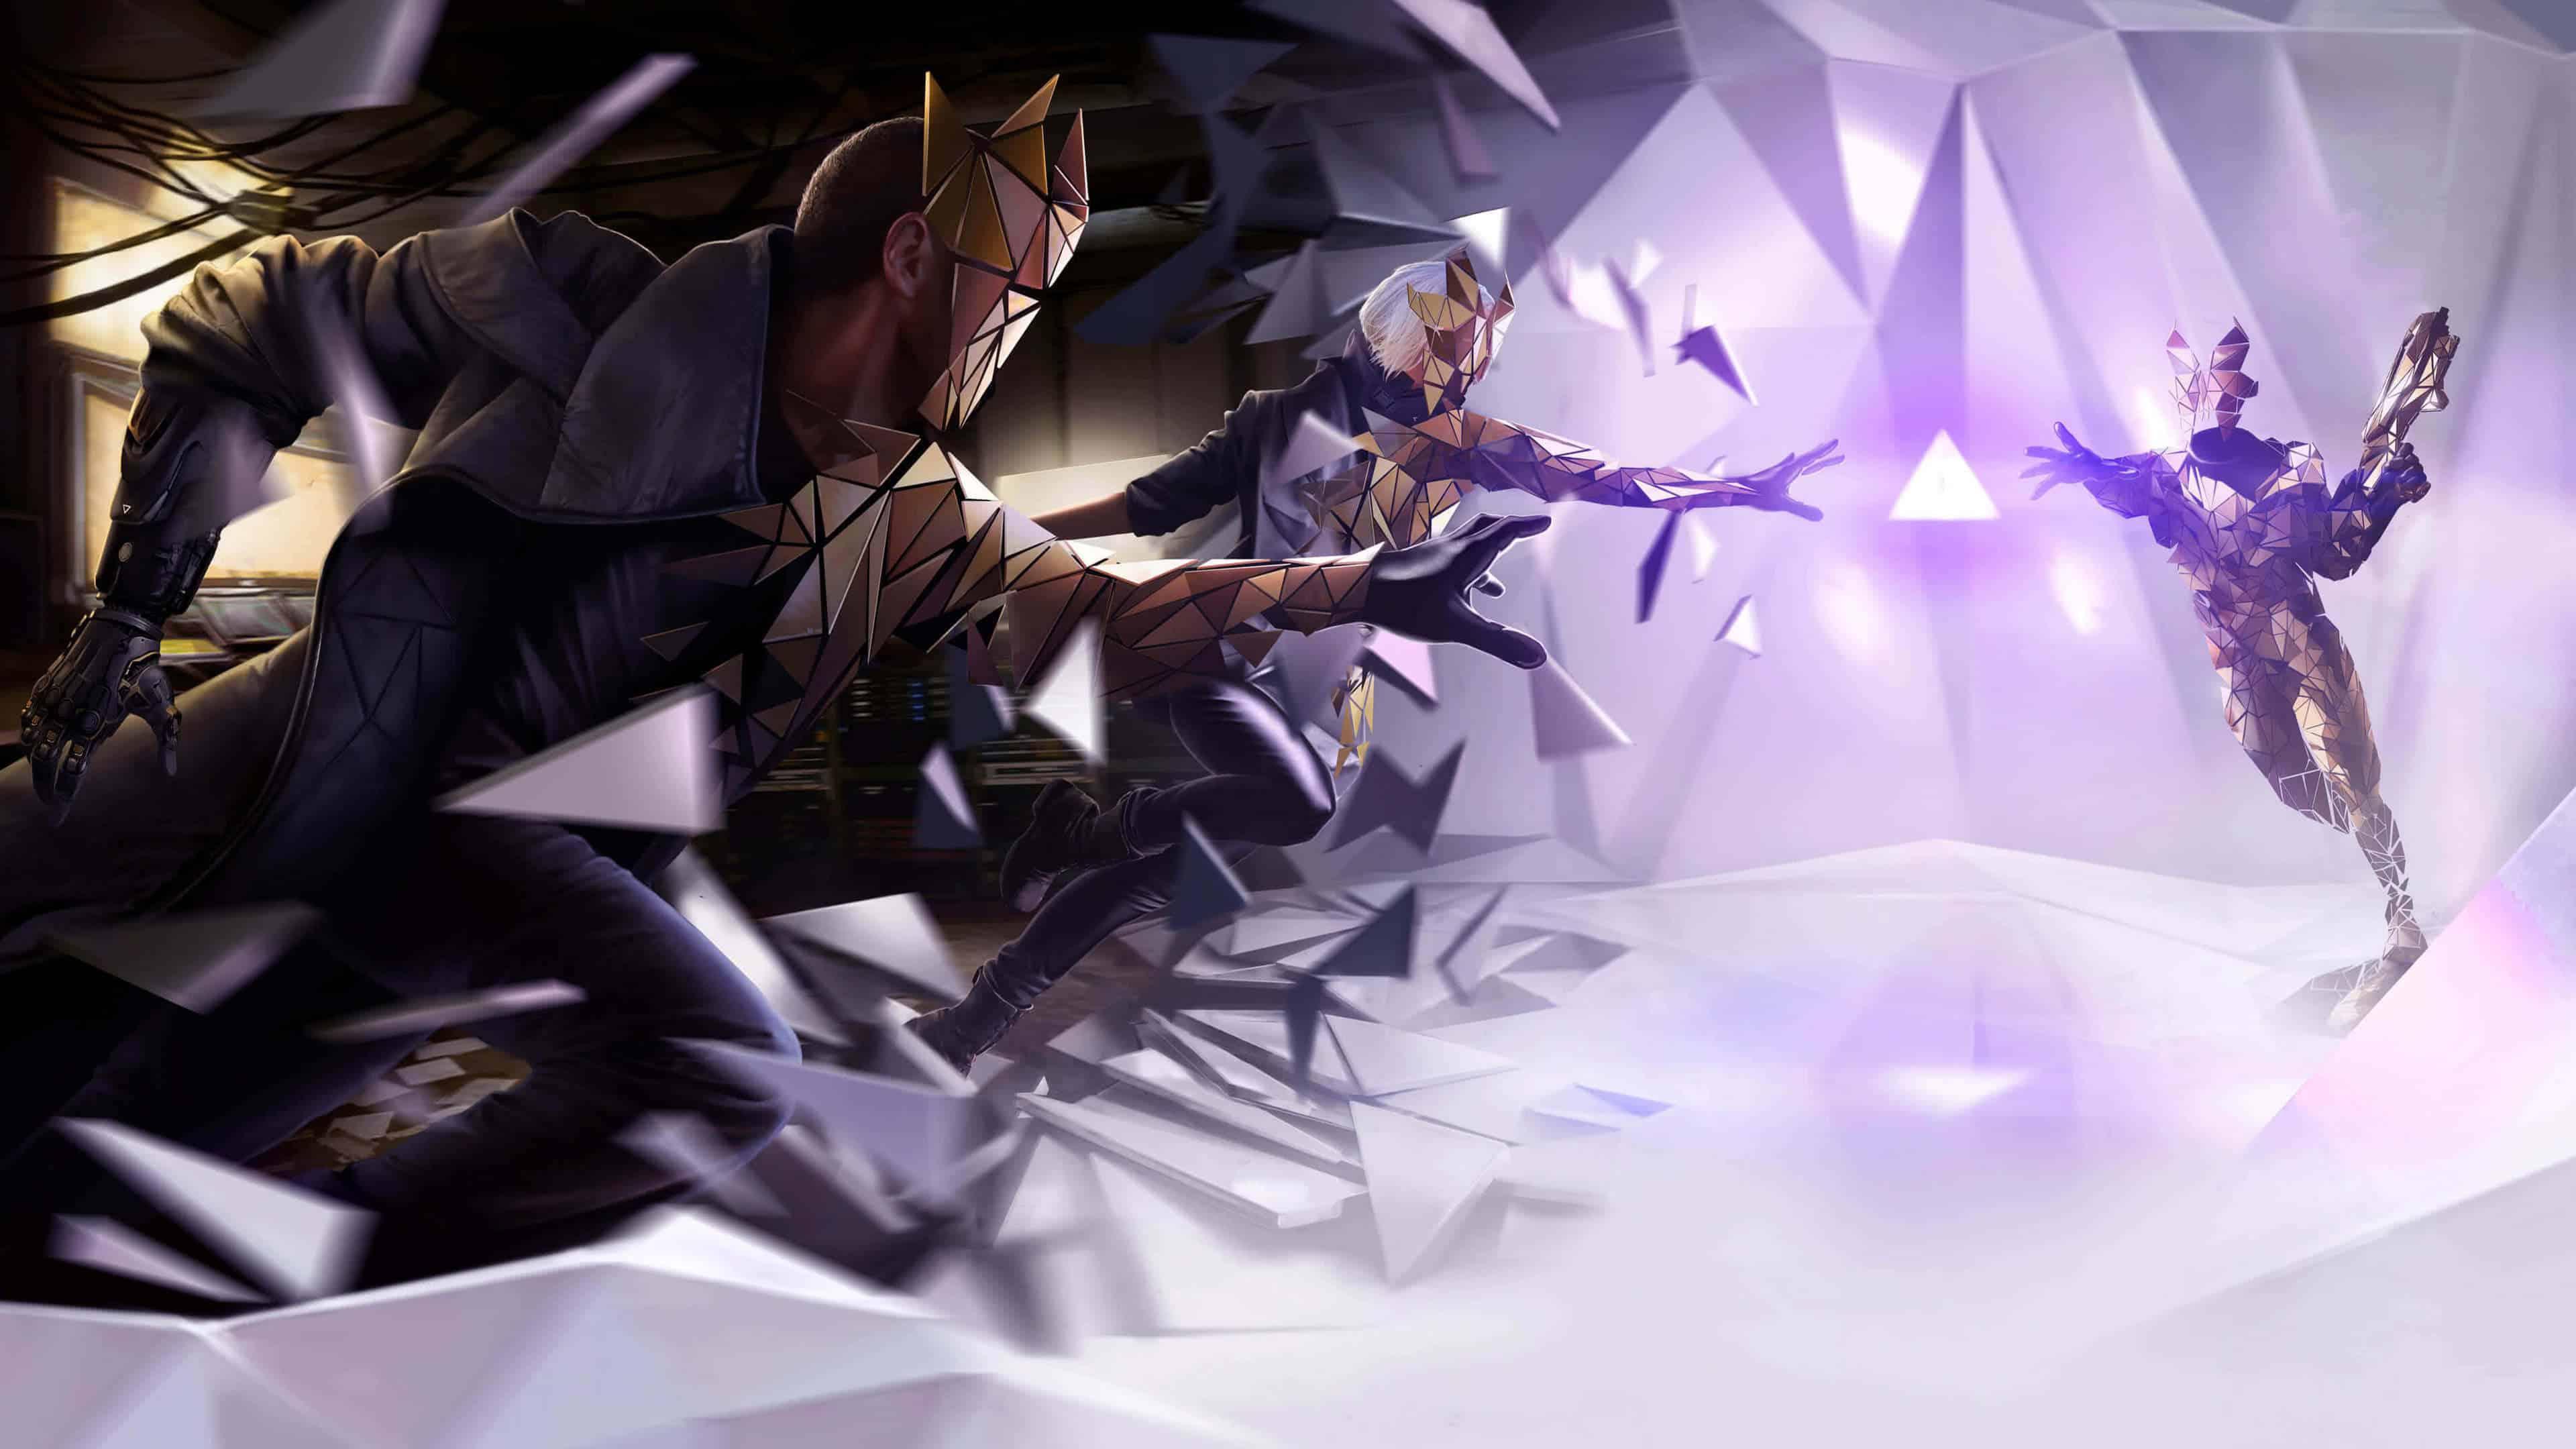 Deus Ex Mankind Divided Breach Mode Uhd 4k Wallpaper Pixelz